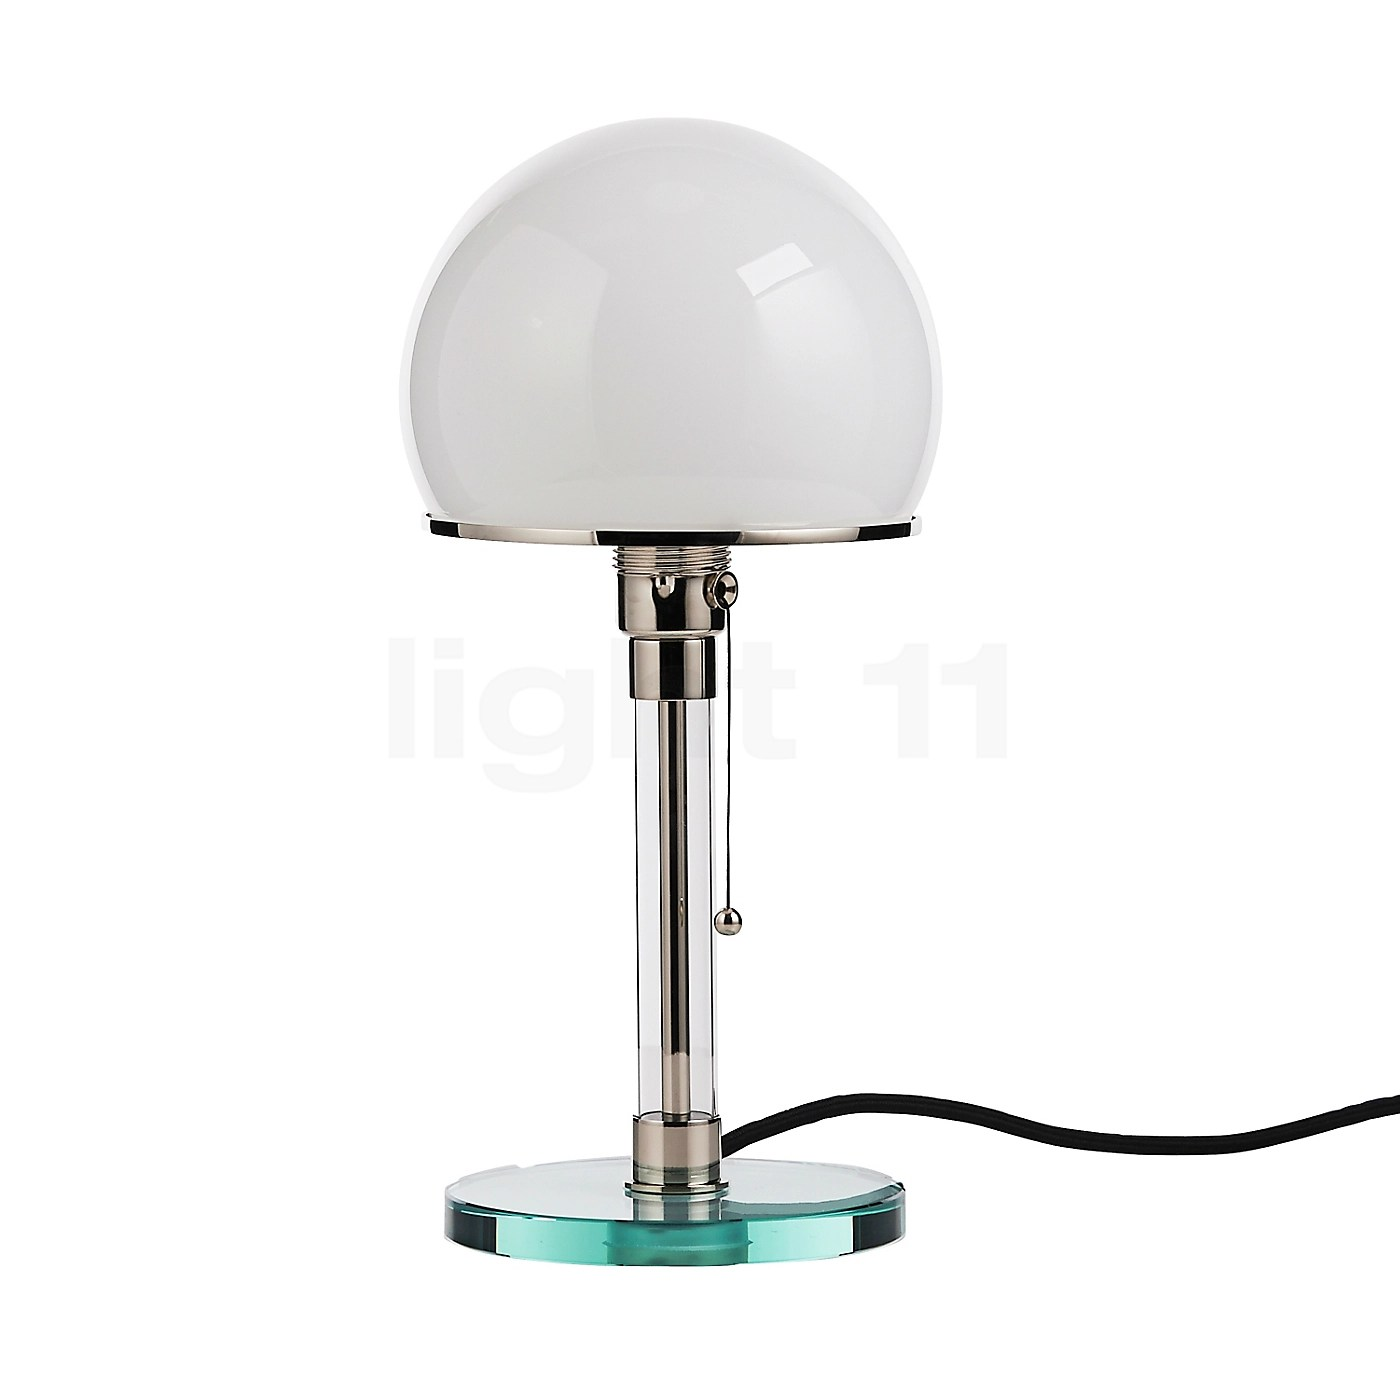 Tecnolumen Wagenfeld WG 24 Table Lamp Table Lamps Buy At